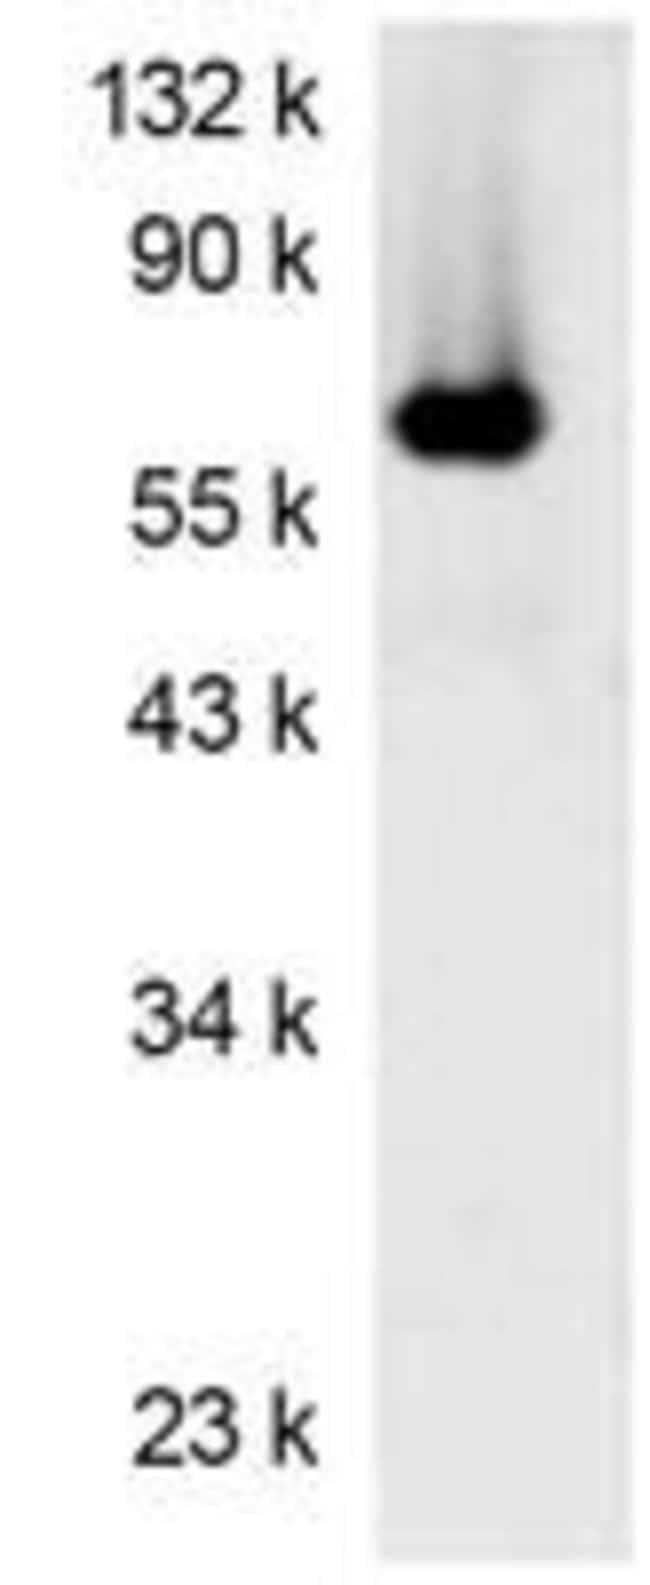 Firefly luciferase Mouse anti-Luciferase, Clone: Luci17, Invitrogen 100